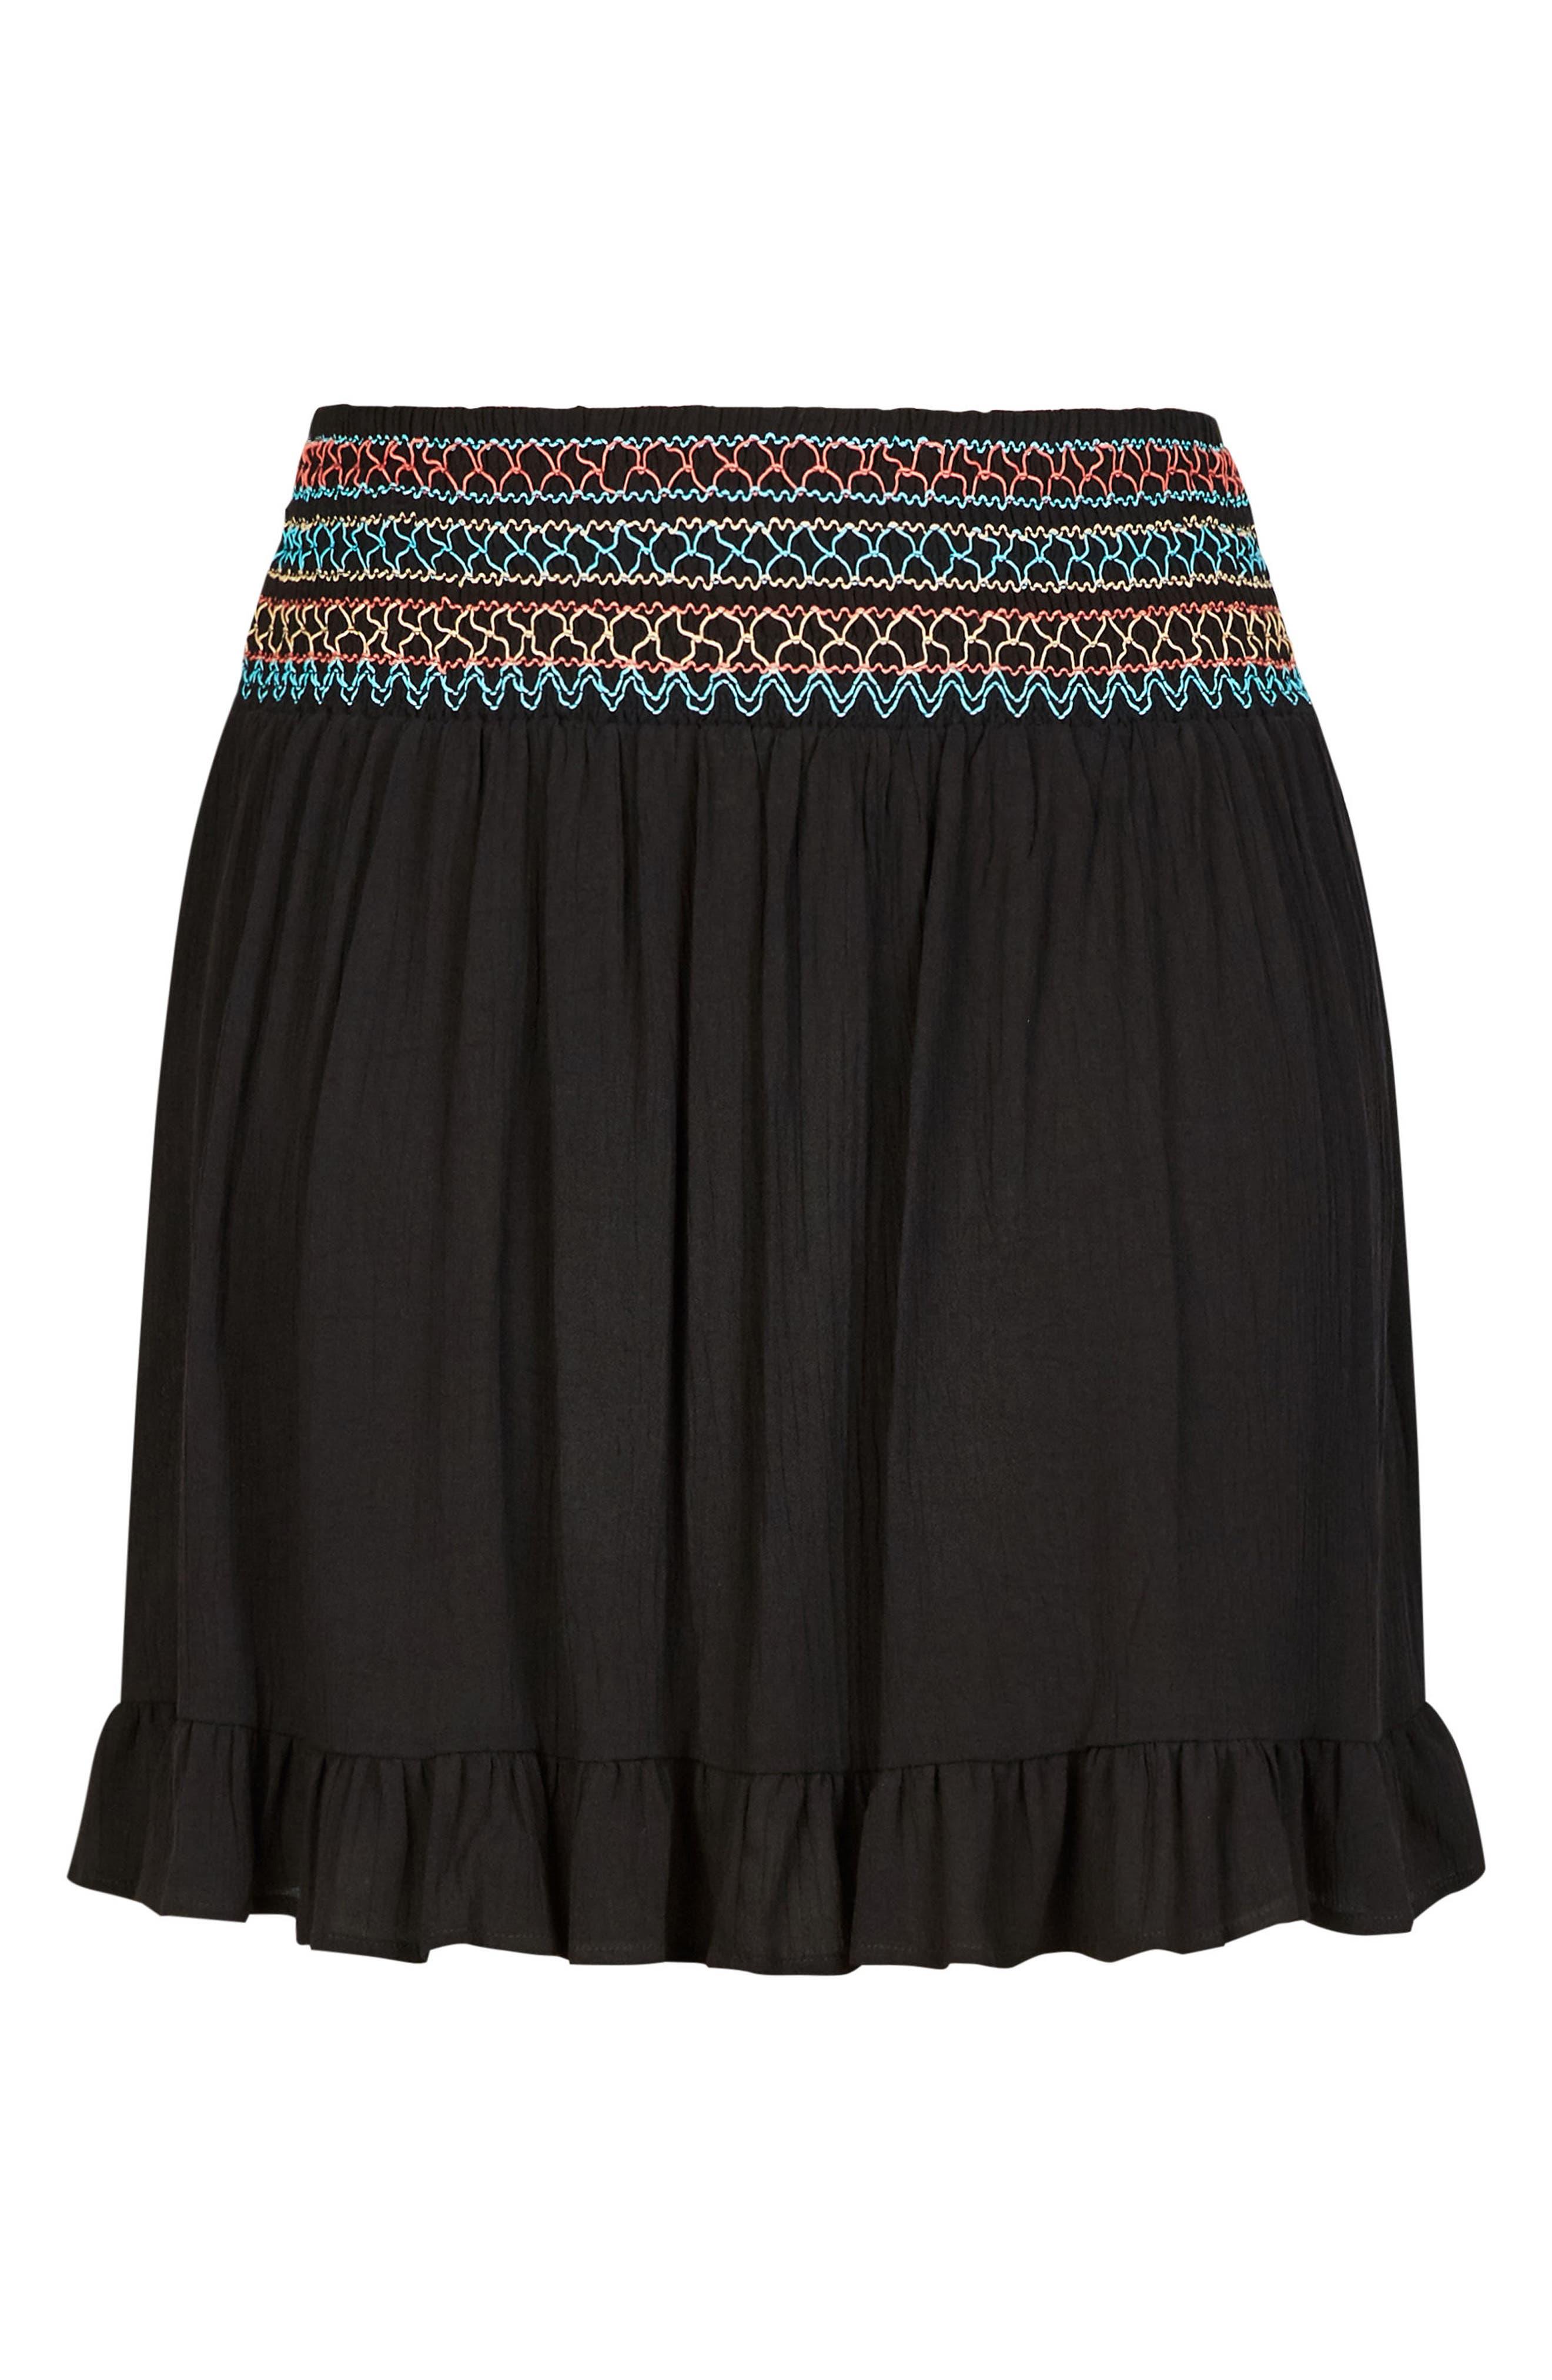 CITY CHIC,                             Makana Skirt,                             Alternate thumbnail 3, color,                             001